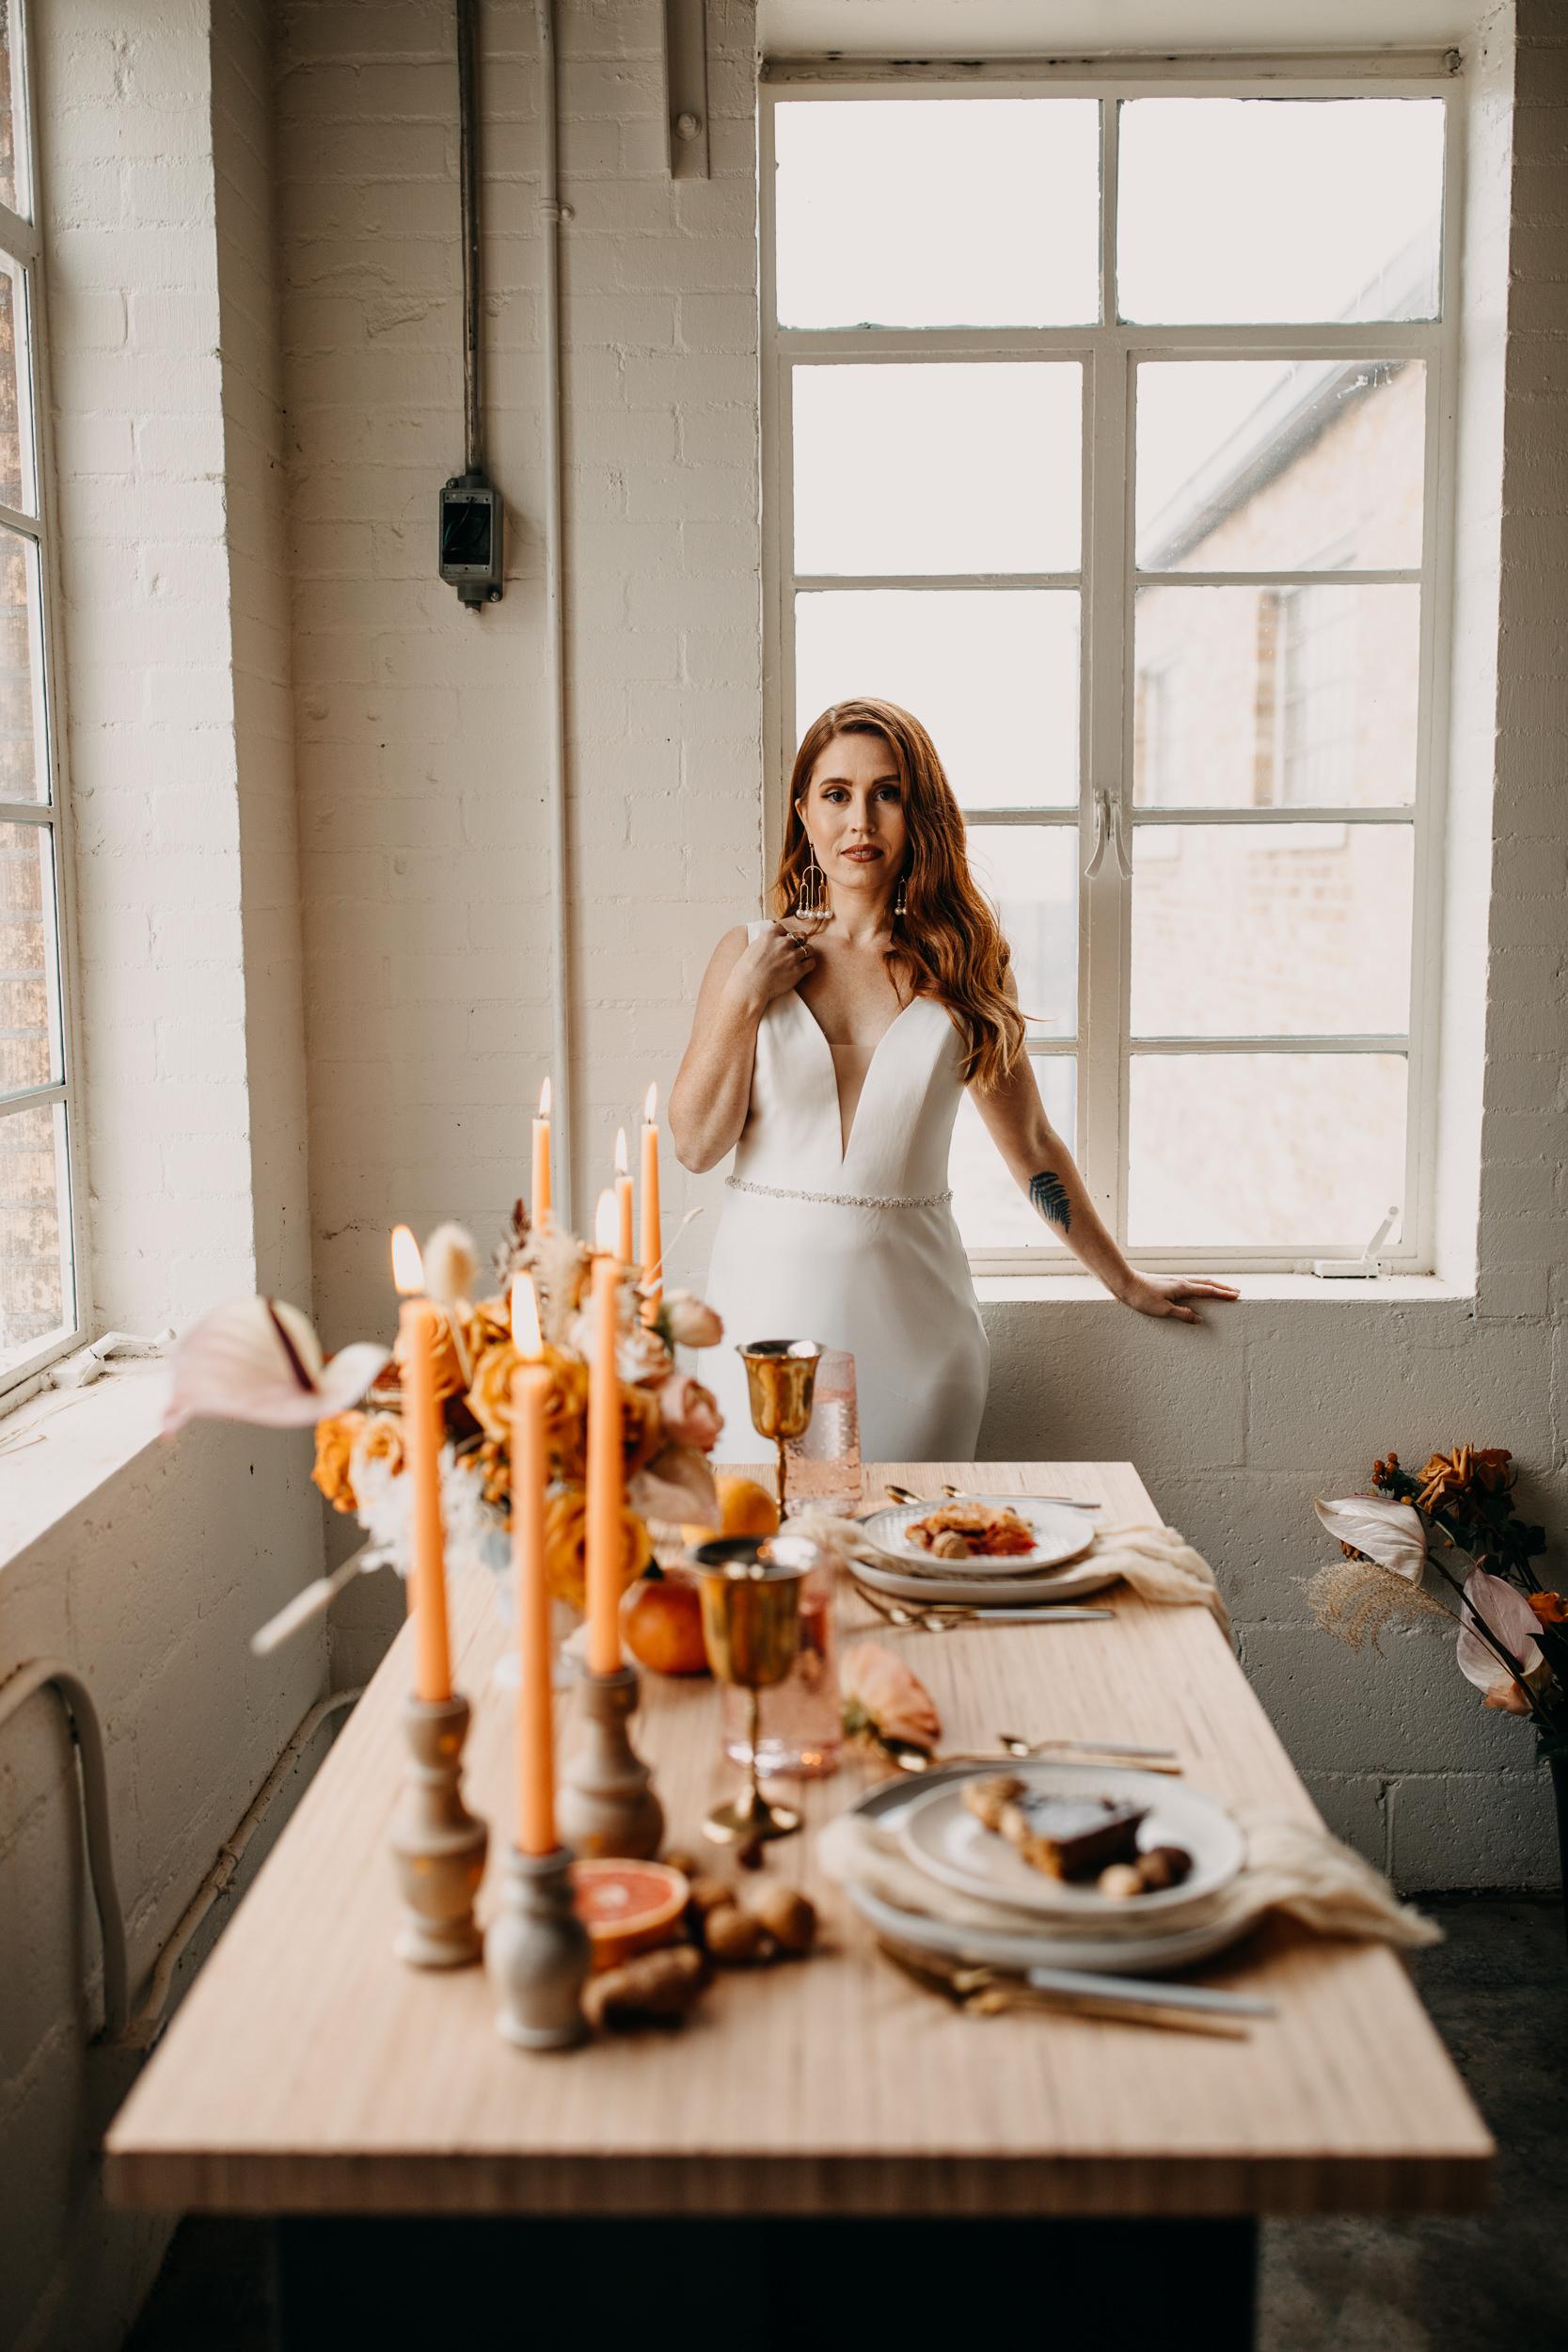 loft wedding. loft elopement. intimate table. intimate tablescape. modern tablescape. light airy table. elopement table